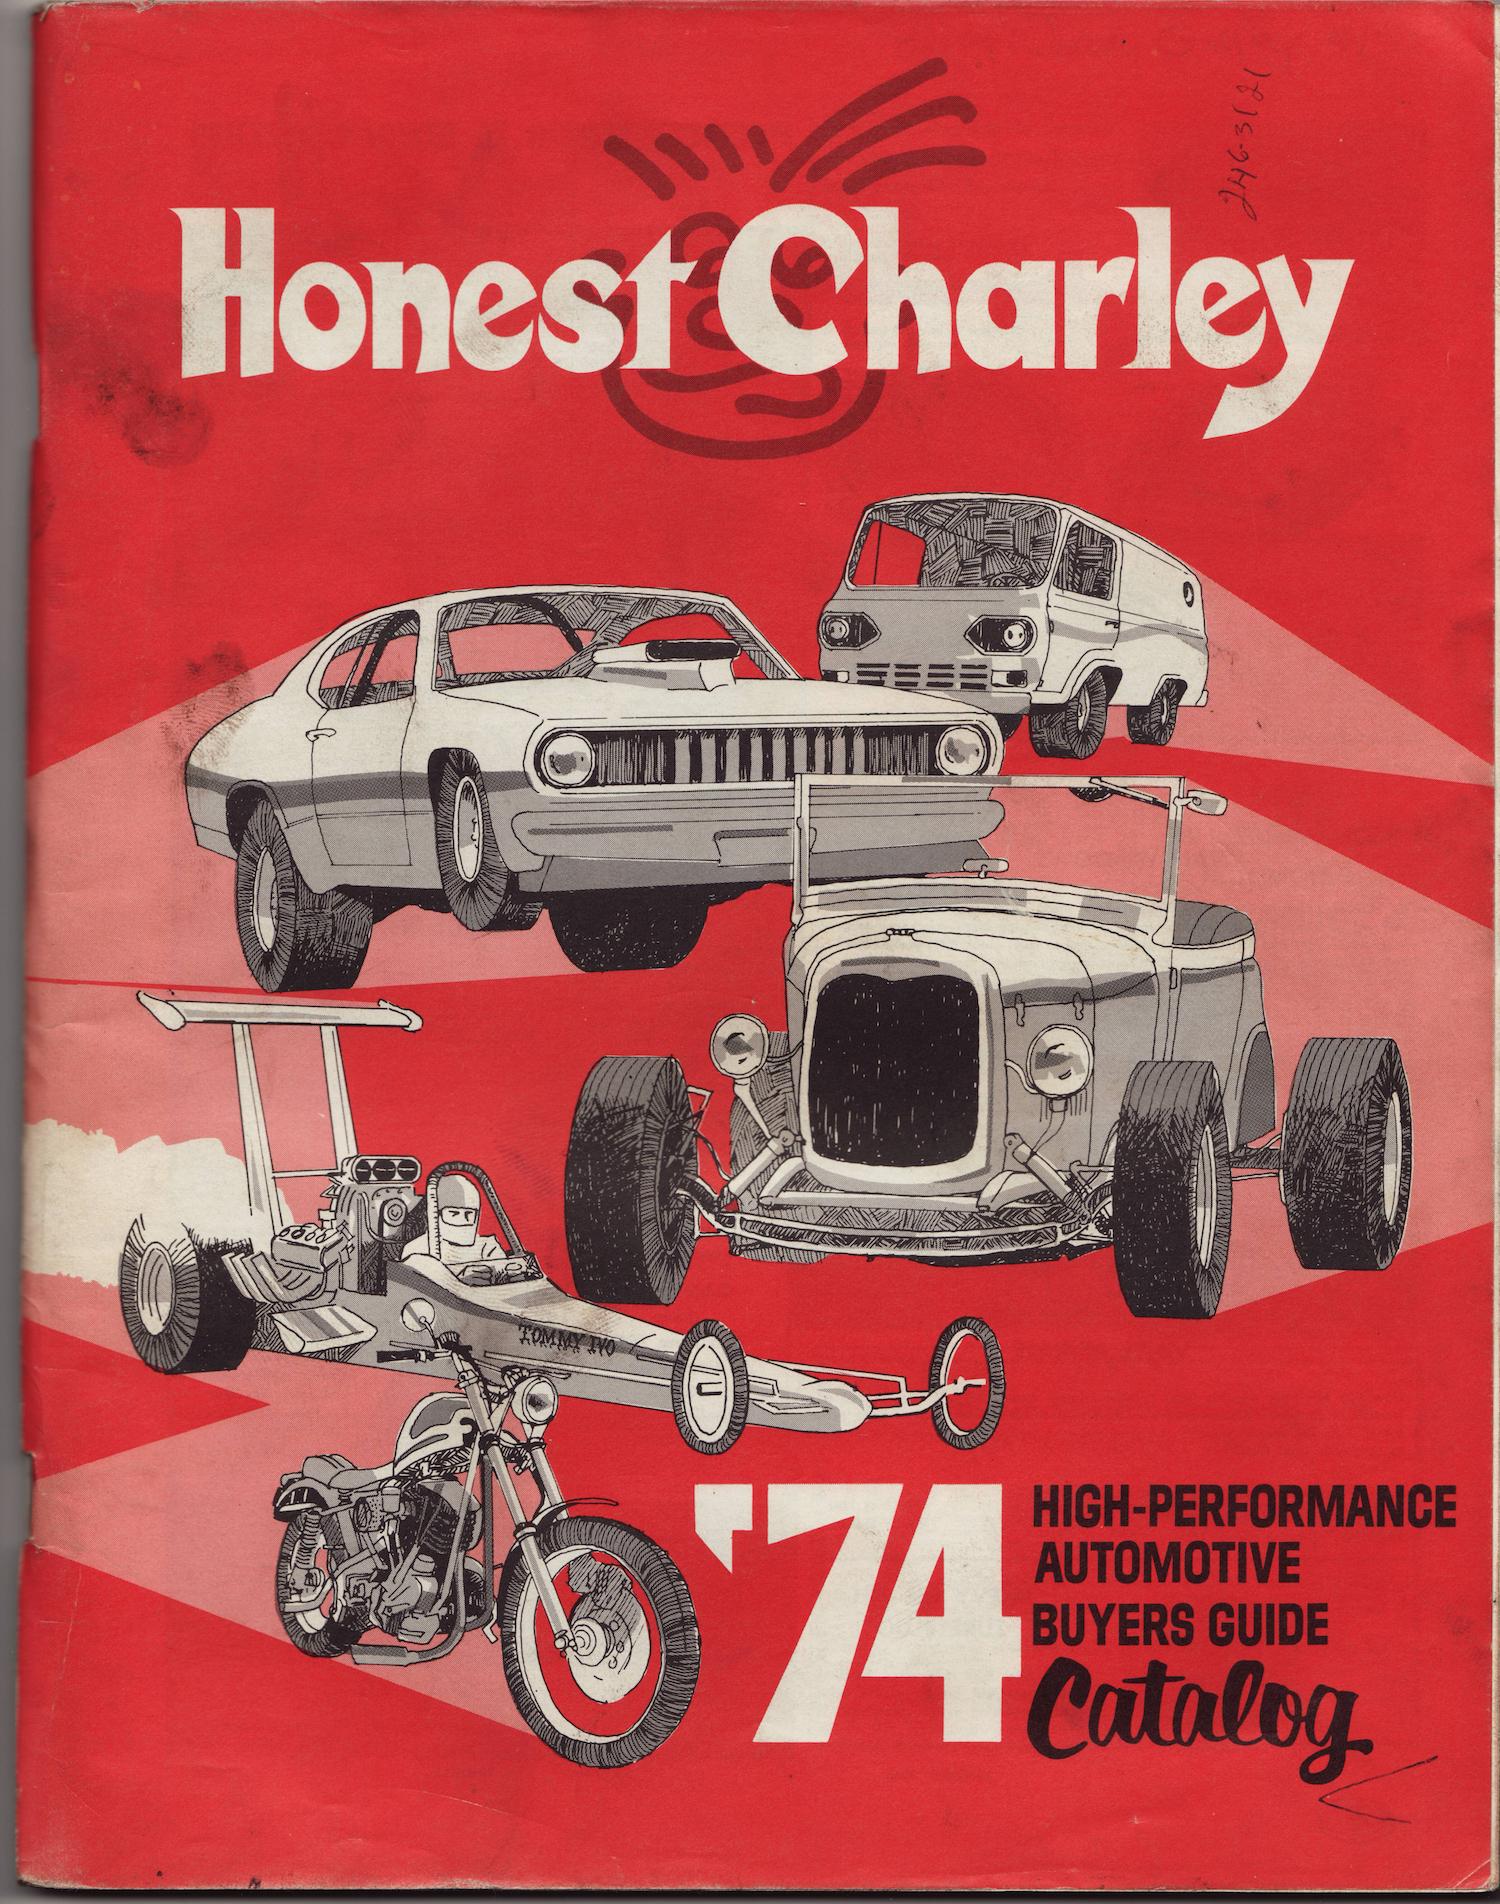 009-Honest-Catalog-1974